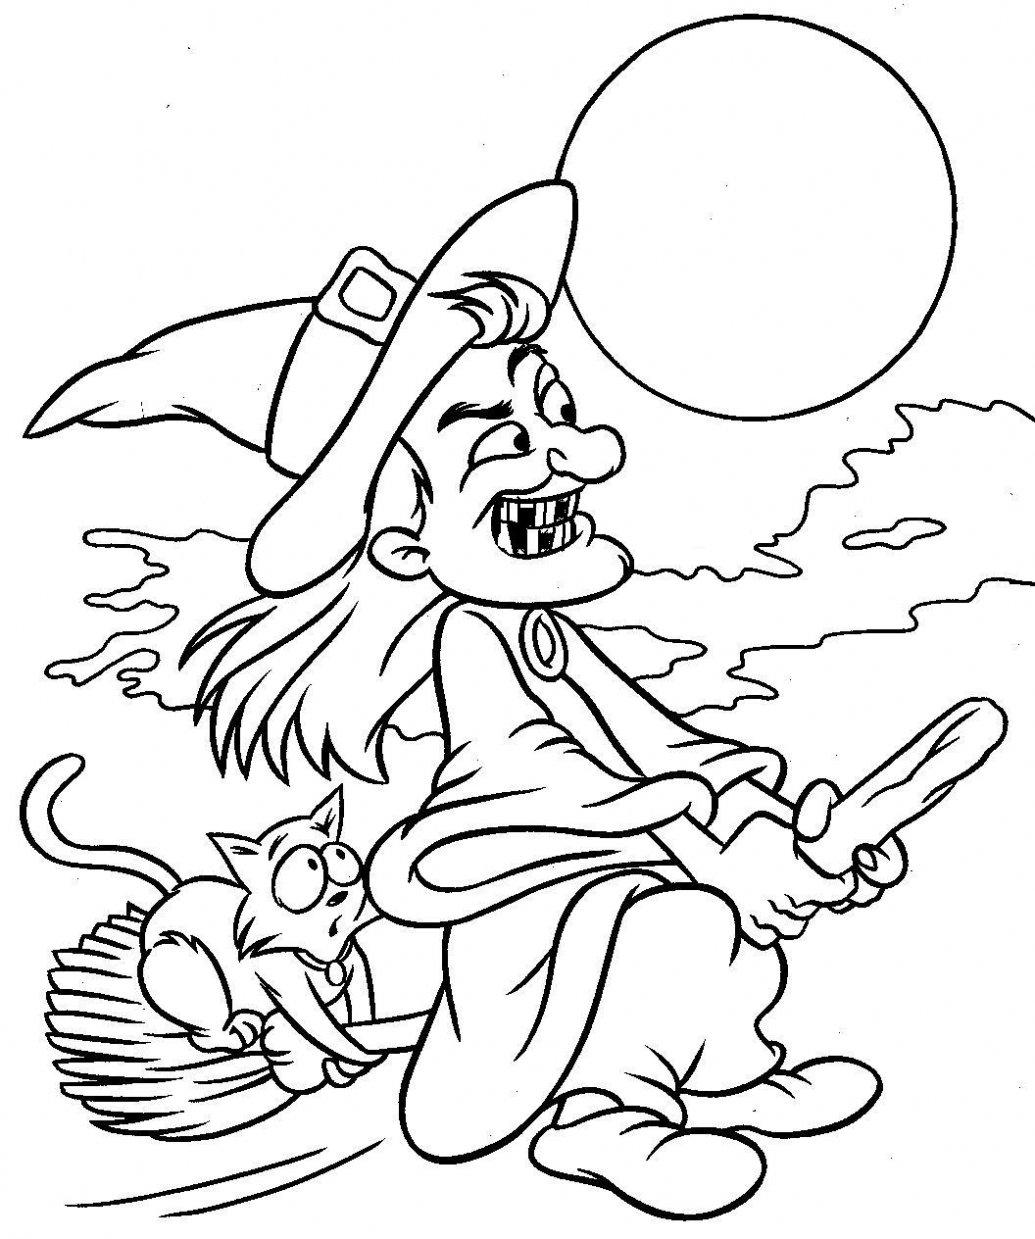 1035x1239 Brujas Para Colorear Imprimir Pintar Dibujos Bruja Dibujos